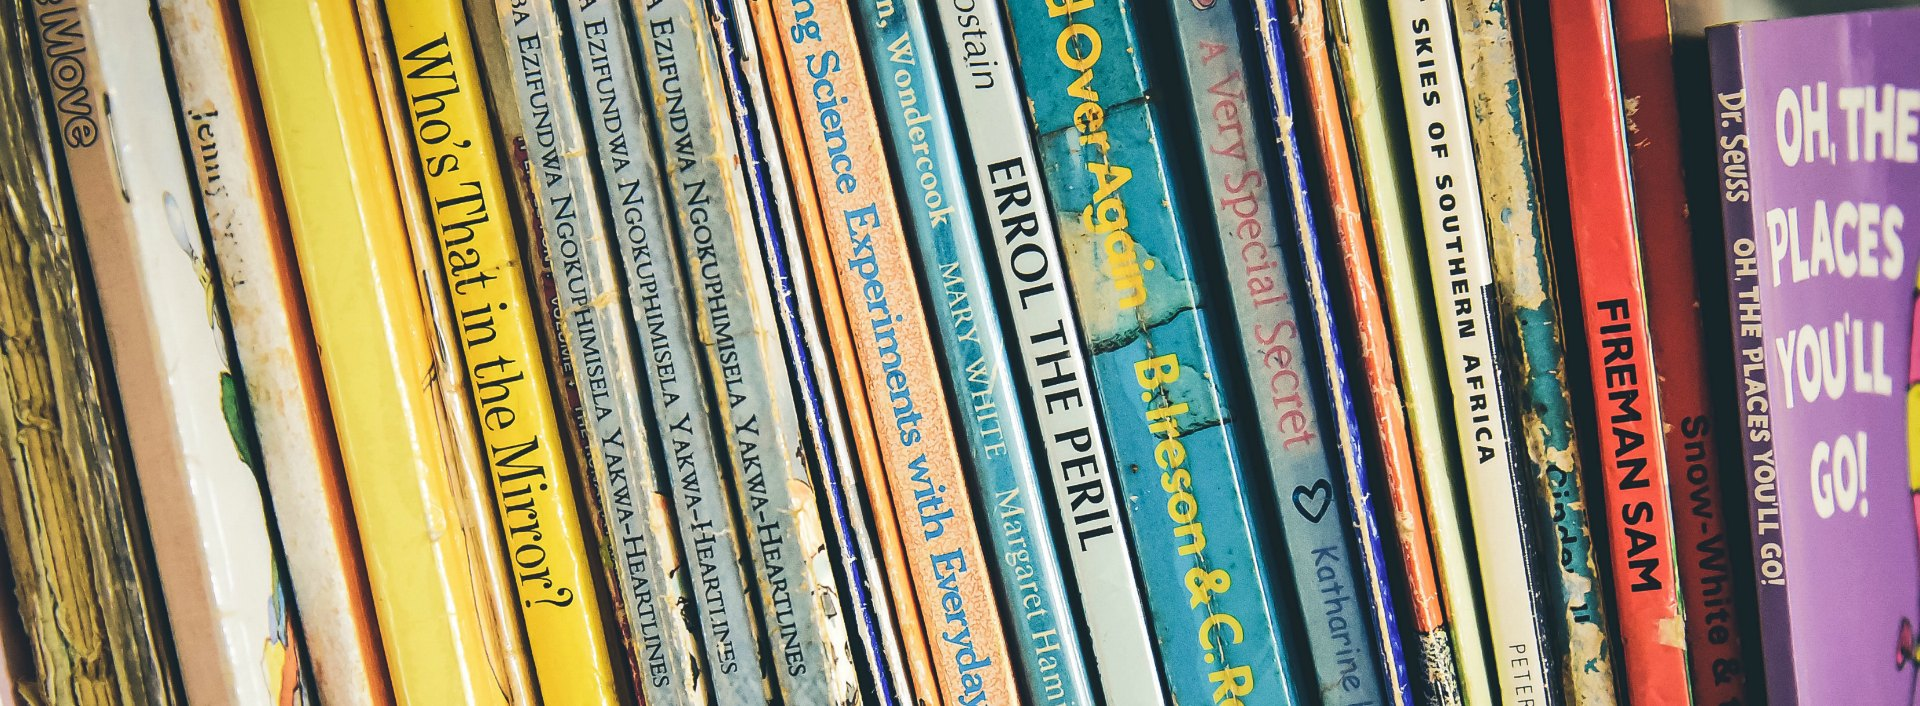 Books to Improve English sitting on a shelf.